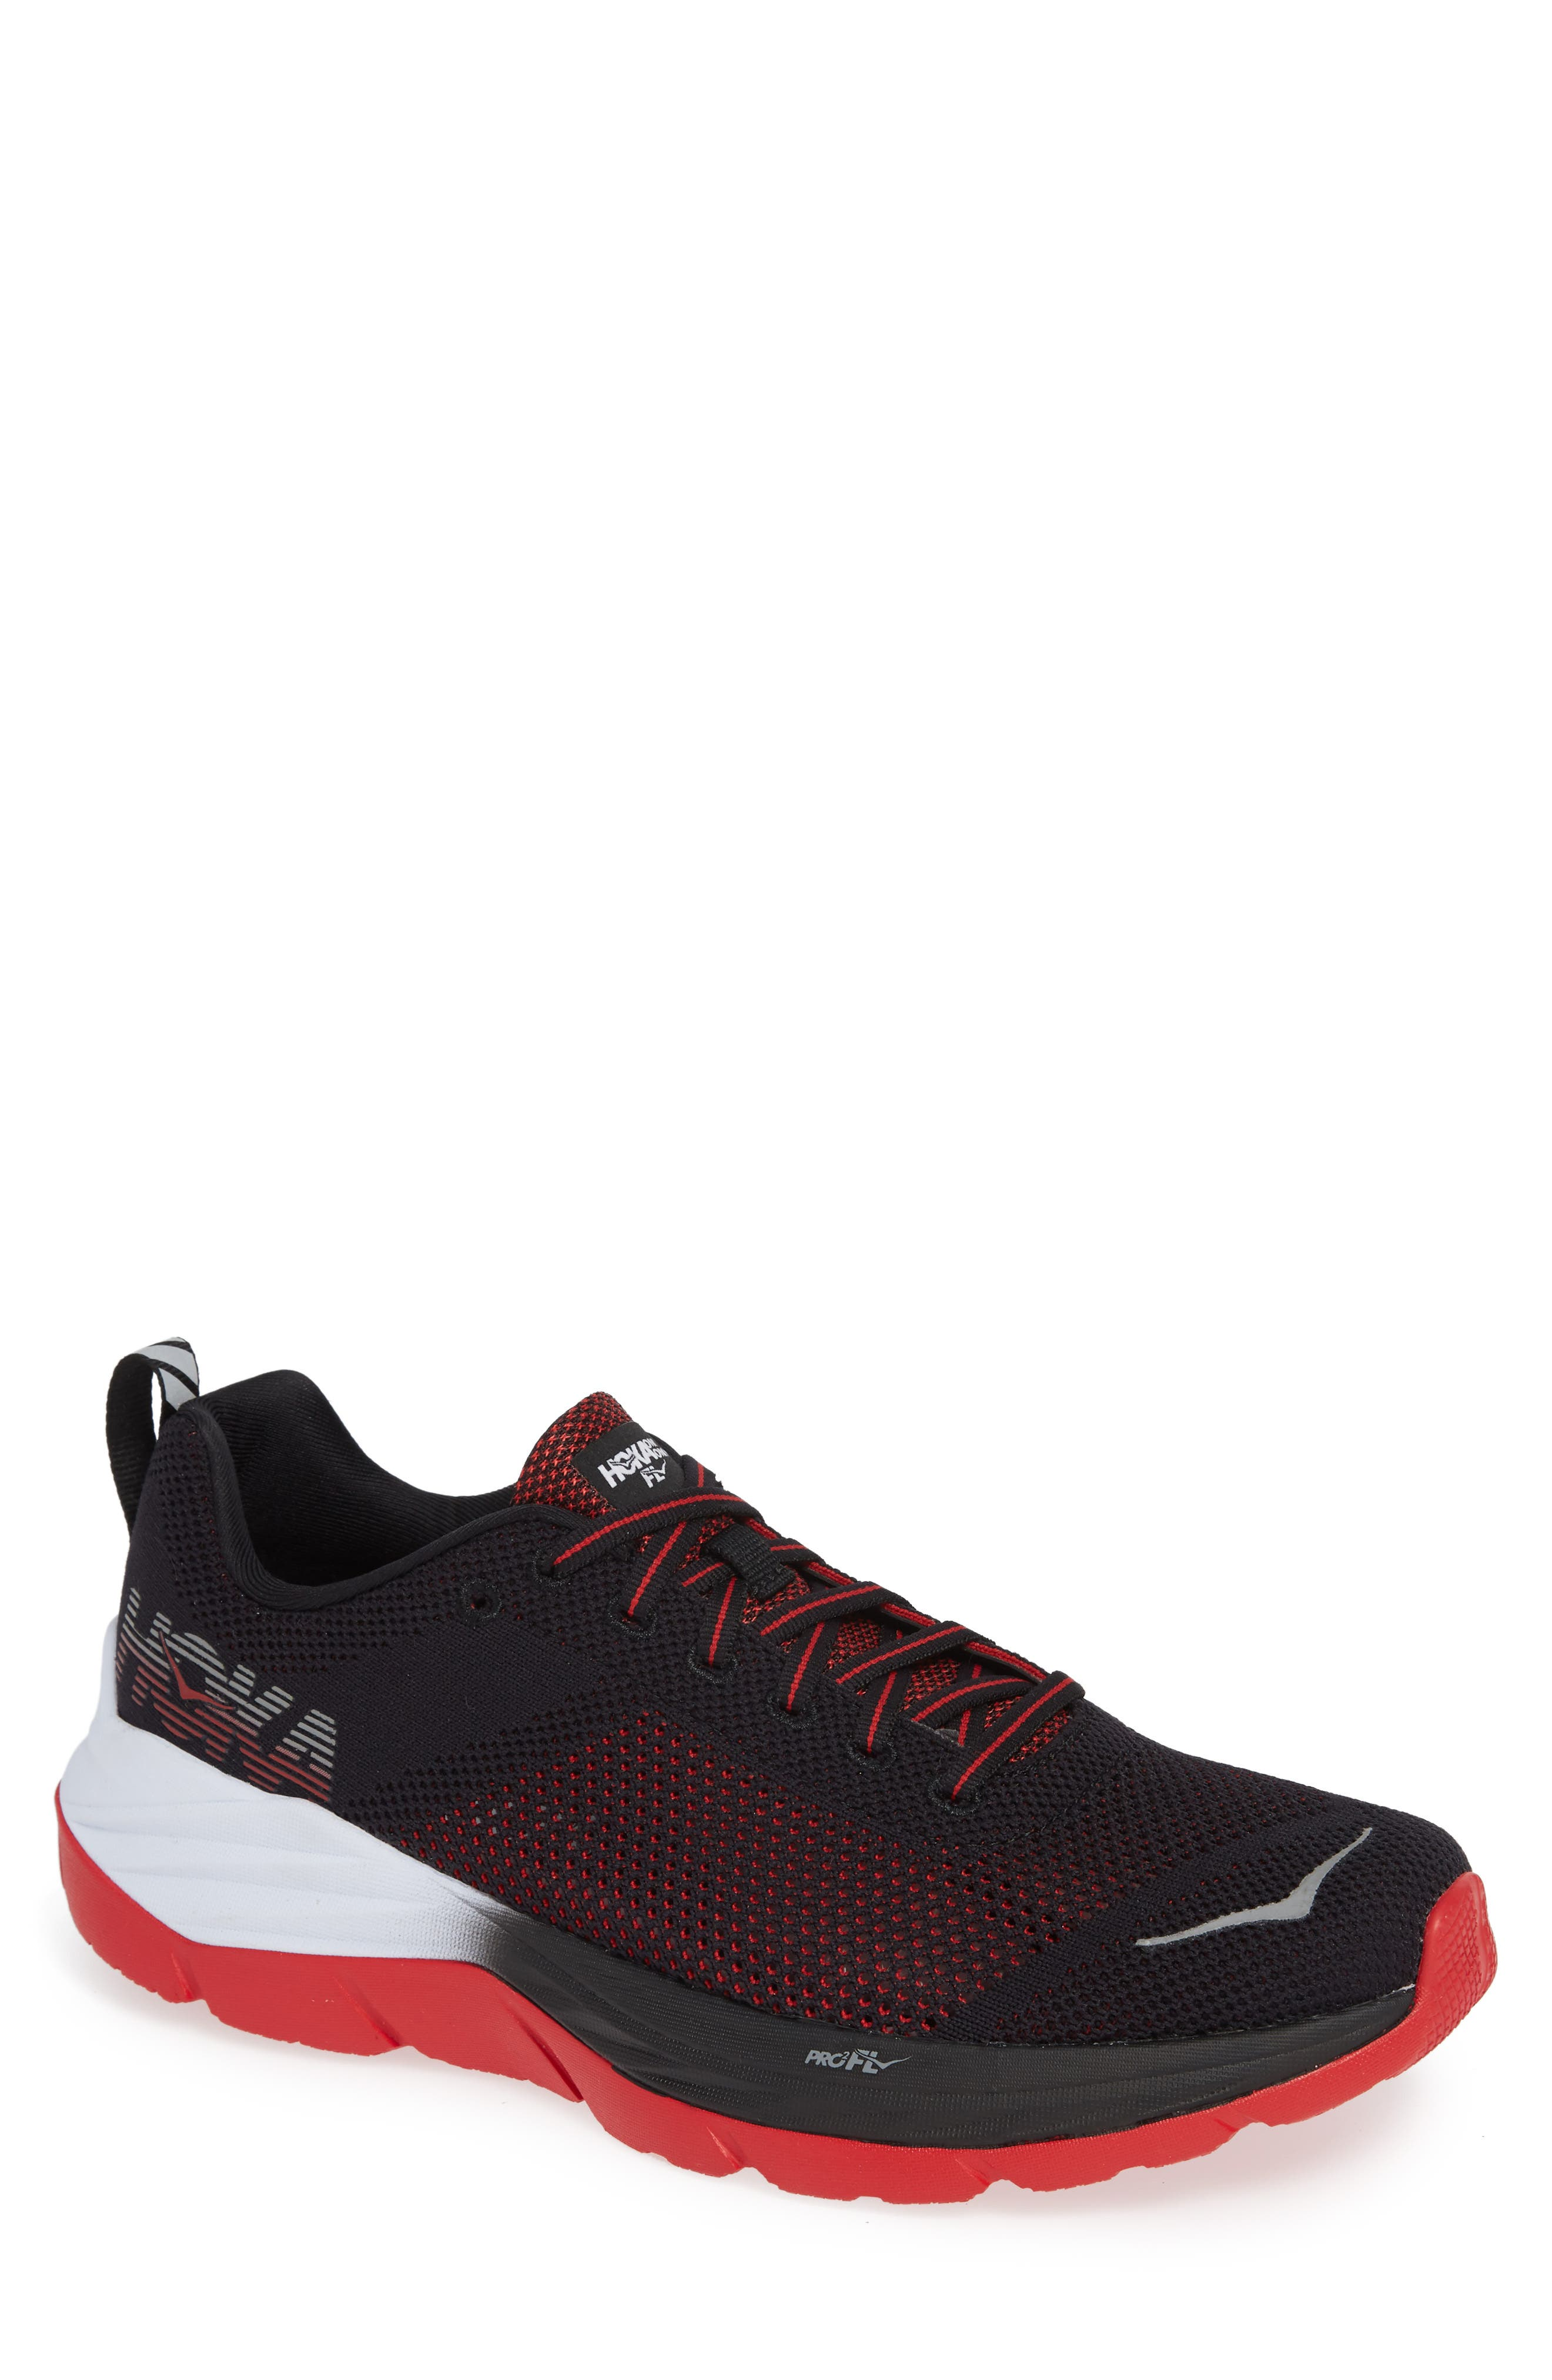 Mach Running Shoe,                         Main,                         color, BLACK/ WHITE